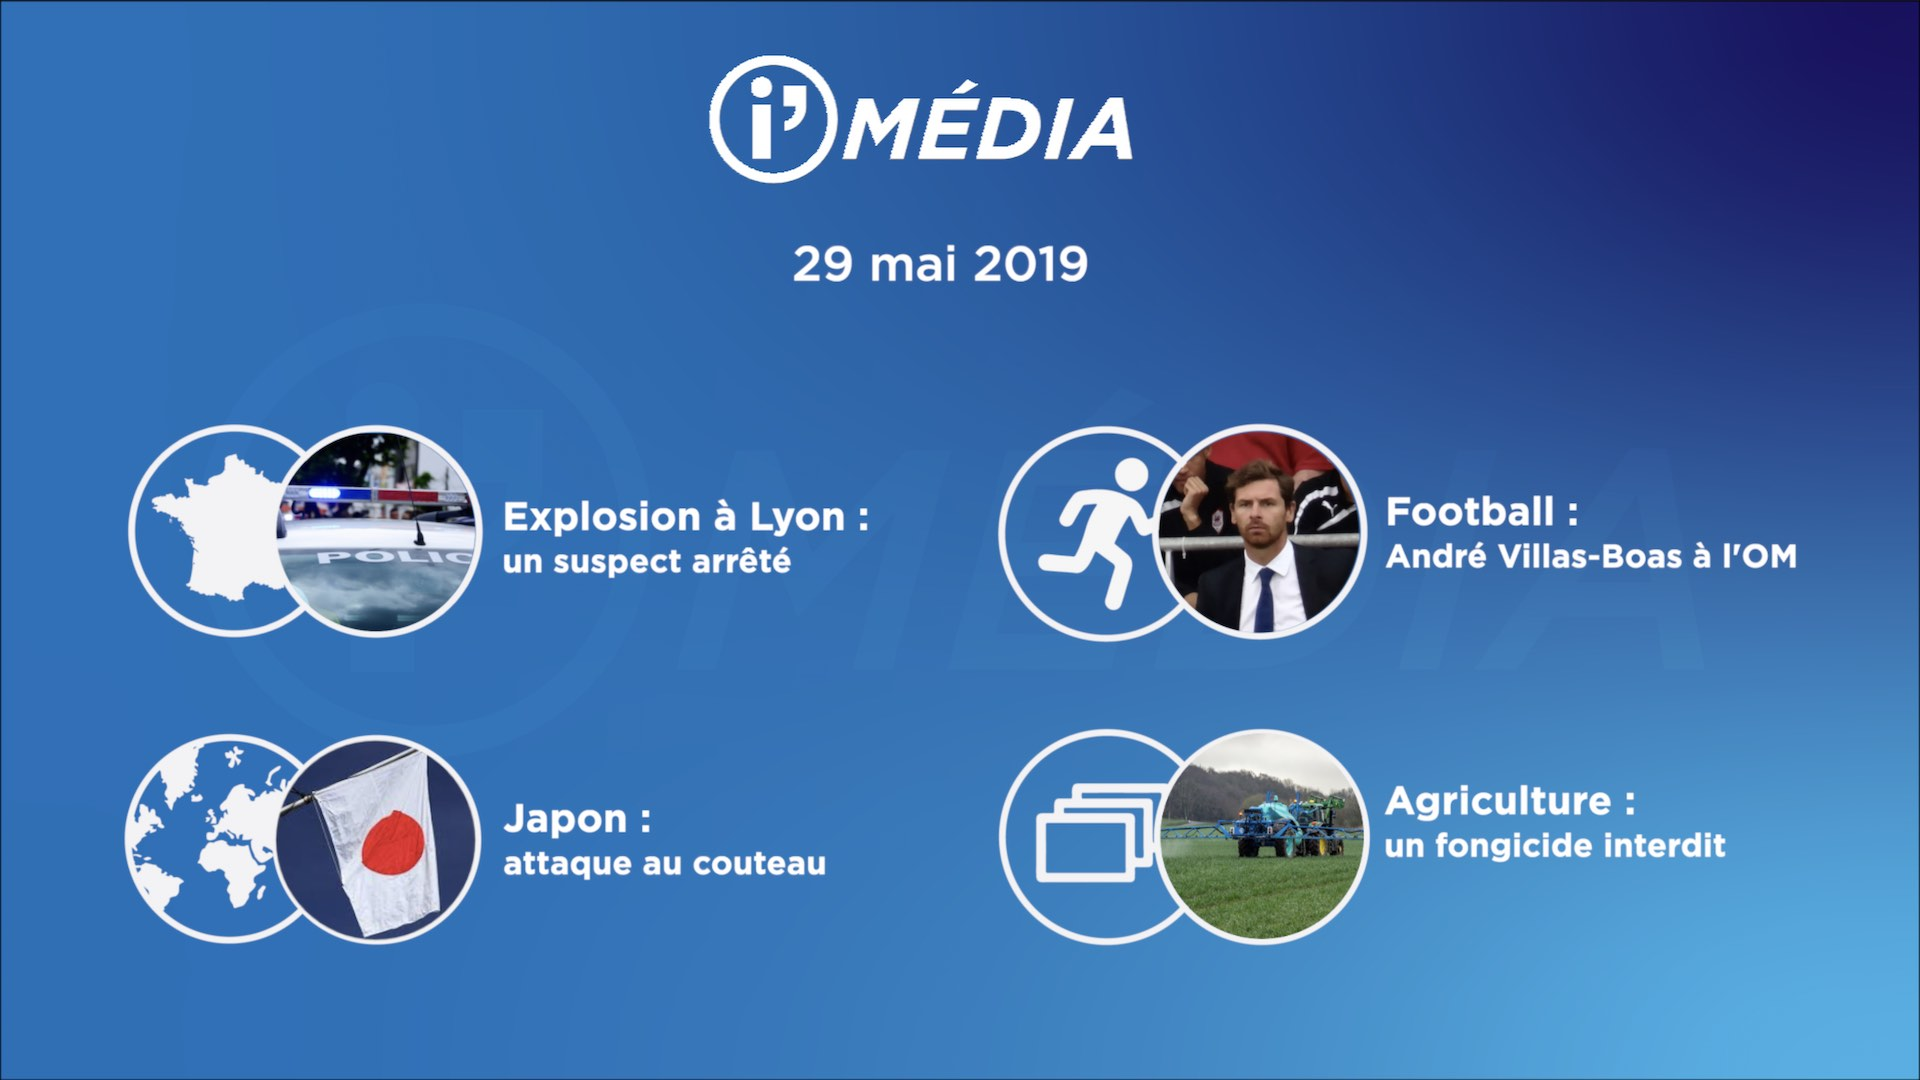 I'Média 29 mai 2019